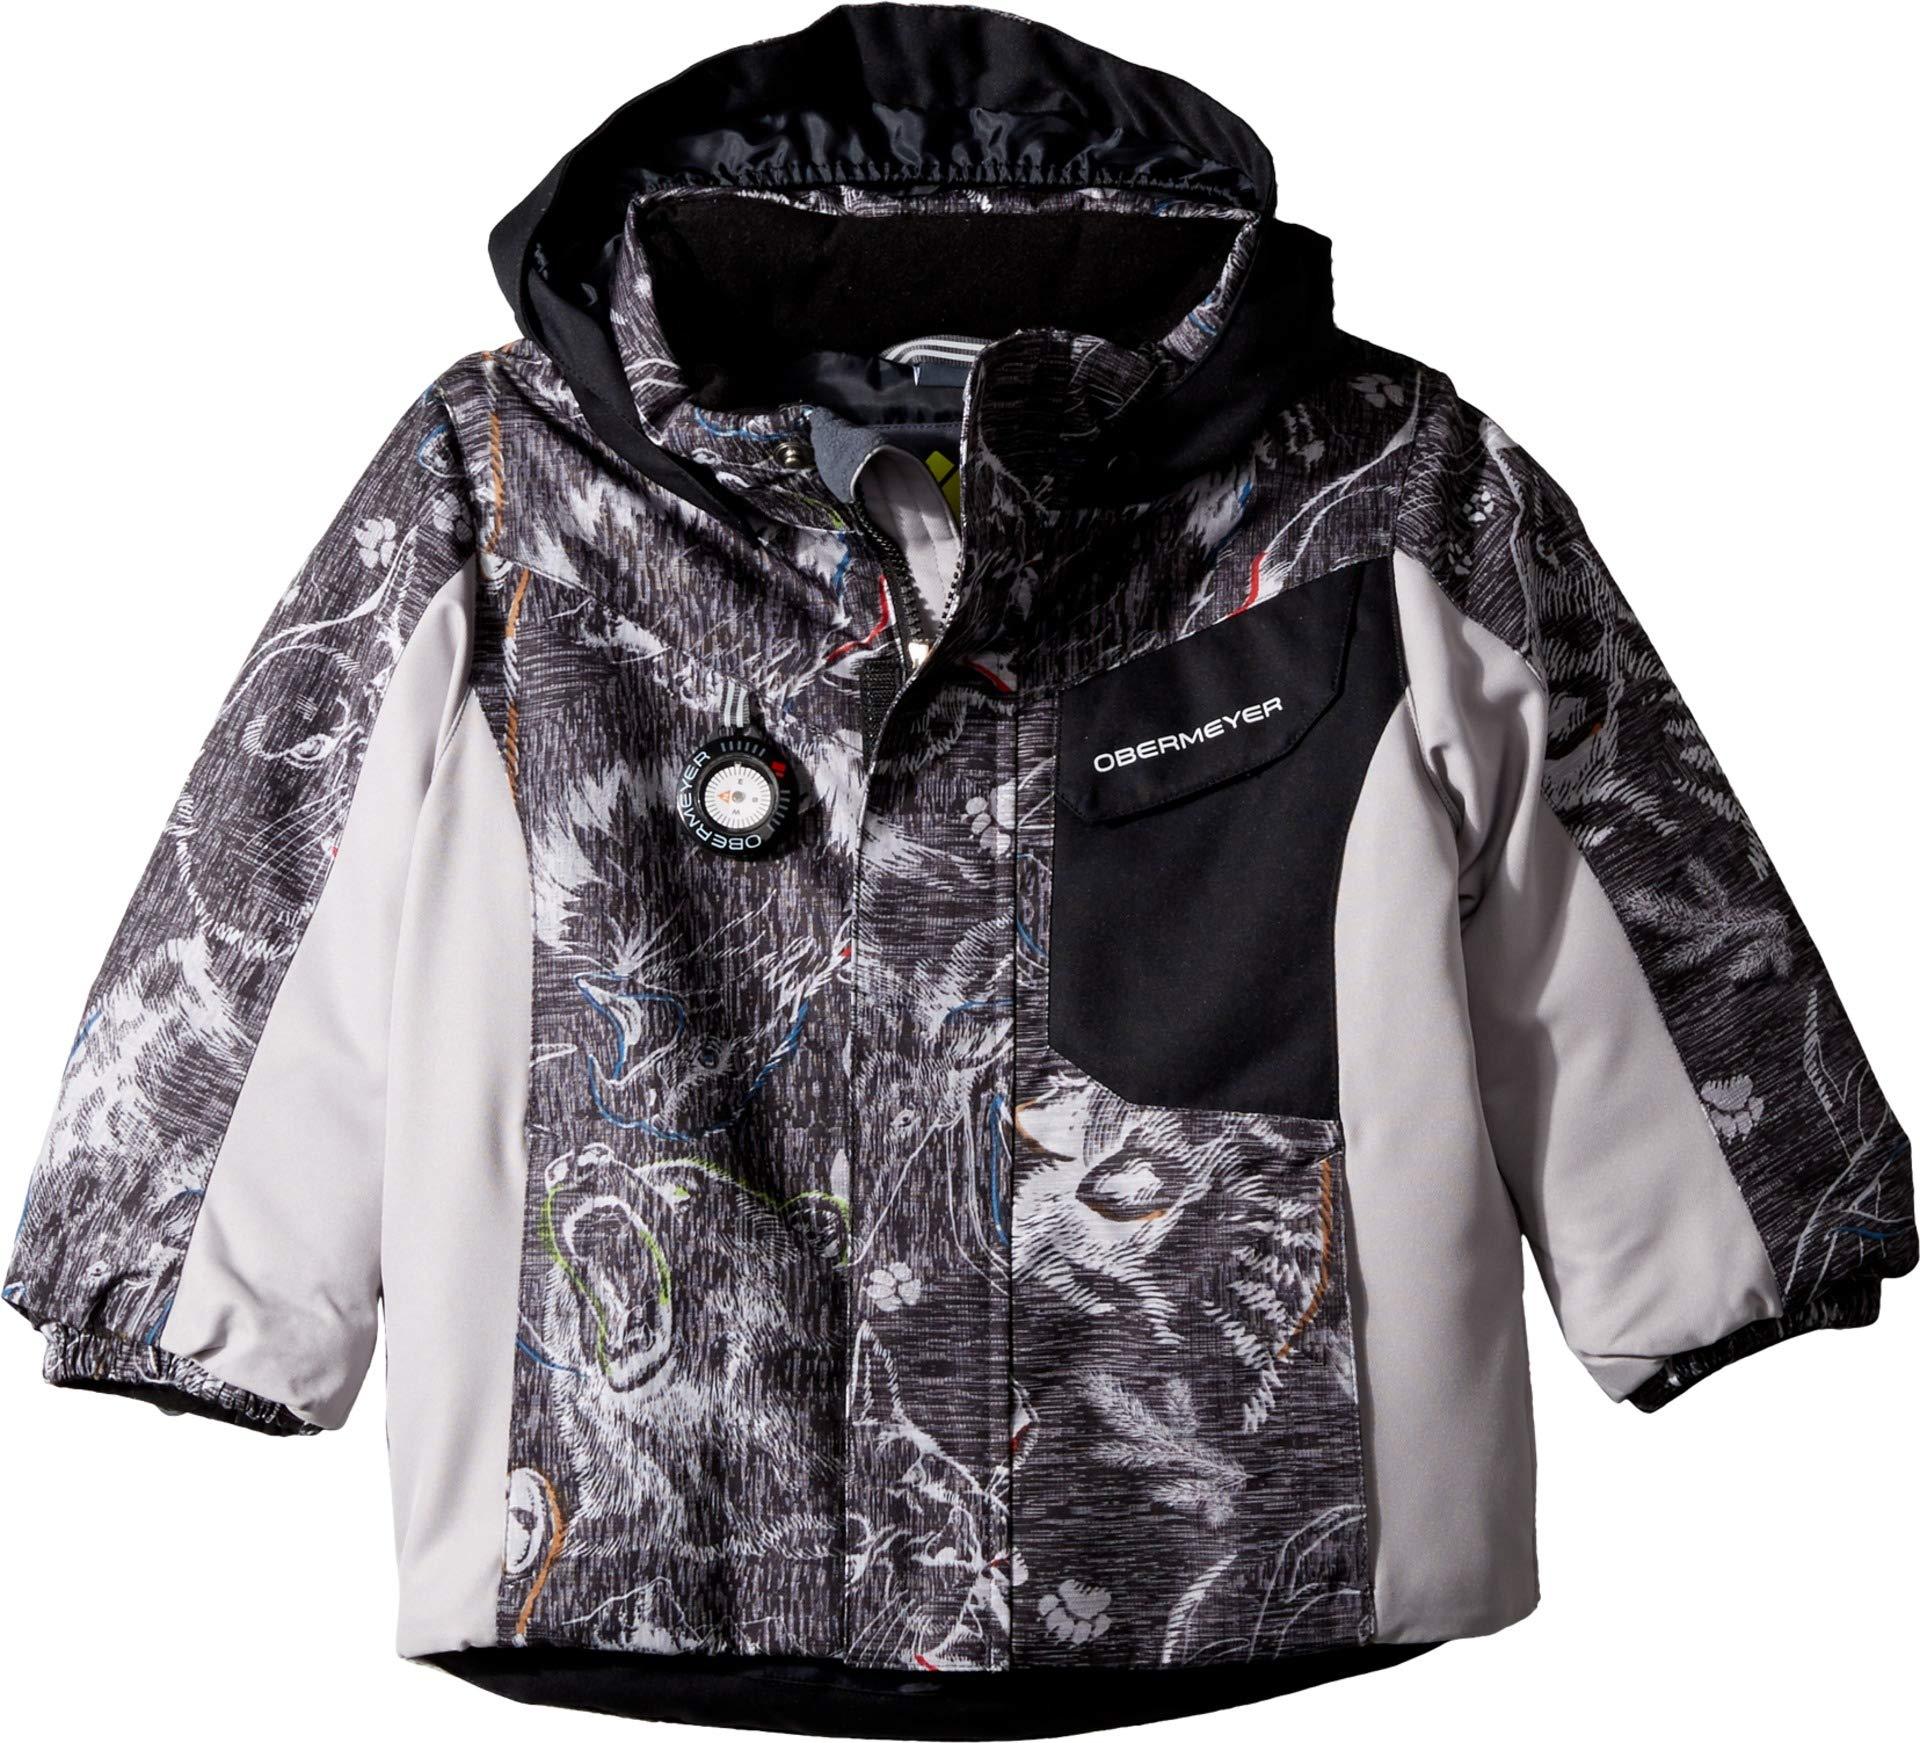 Obermeyer Kids Baby Boy's Galactic Jacket (Toddler/Little Kids/Big Kids) Howl Grey Print 4T